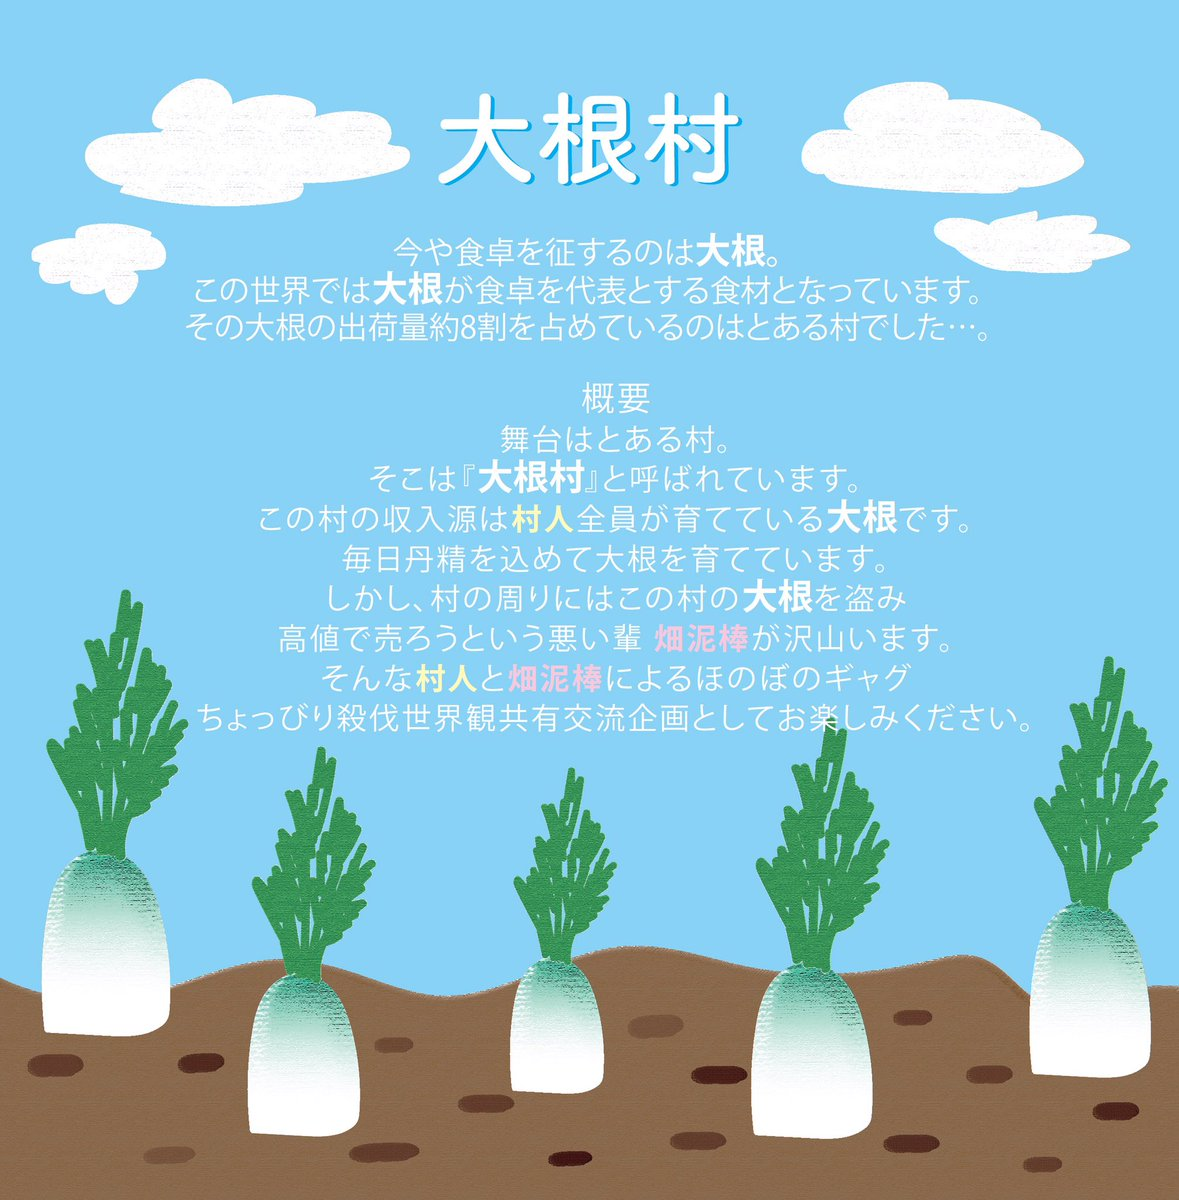 大根村 (@daikon_mura) | Twitte...